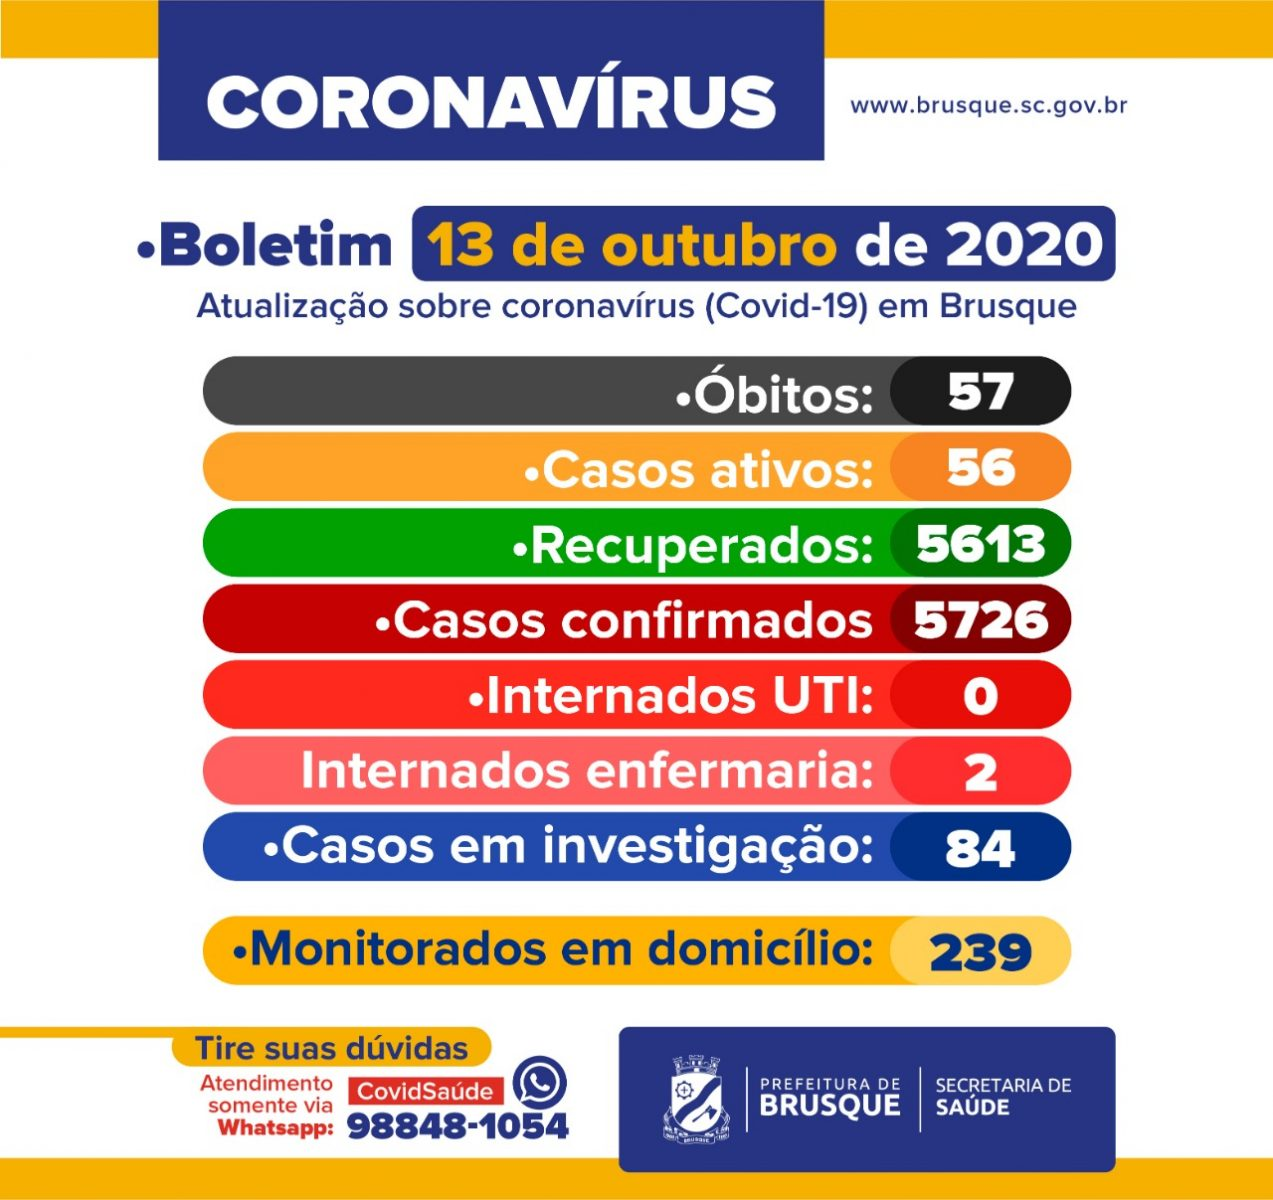 Boletim Epidemiológico de terça-feira, 13 de outubro